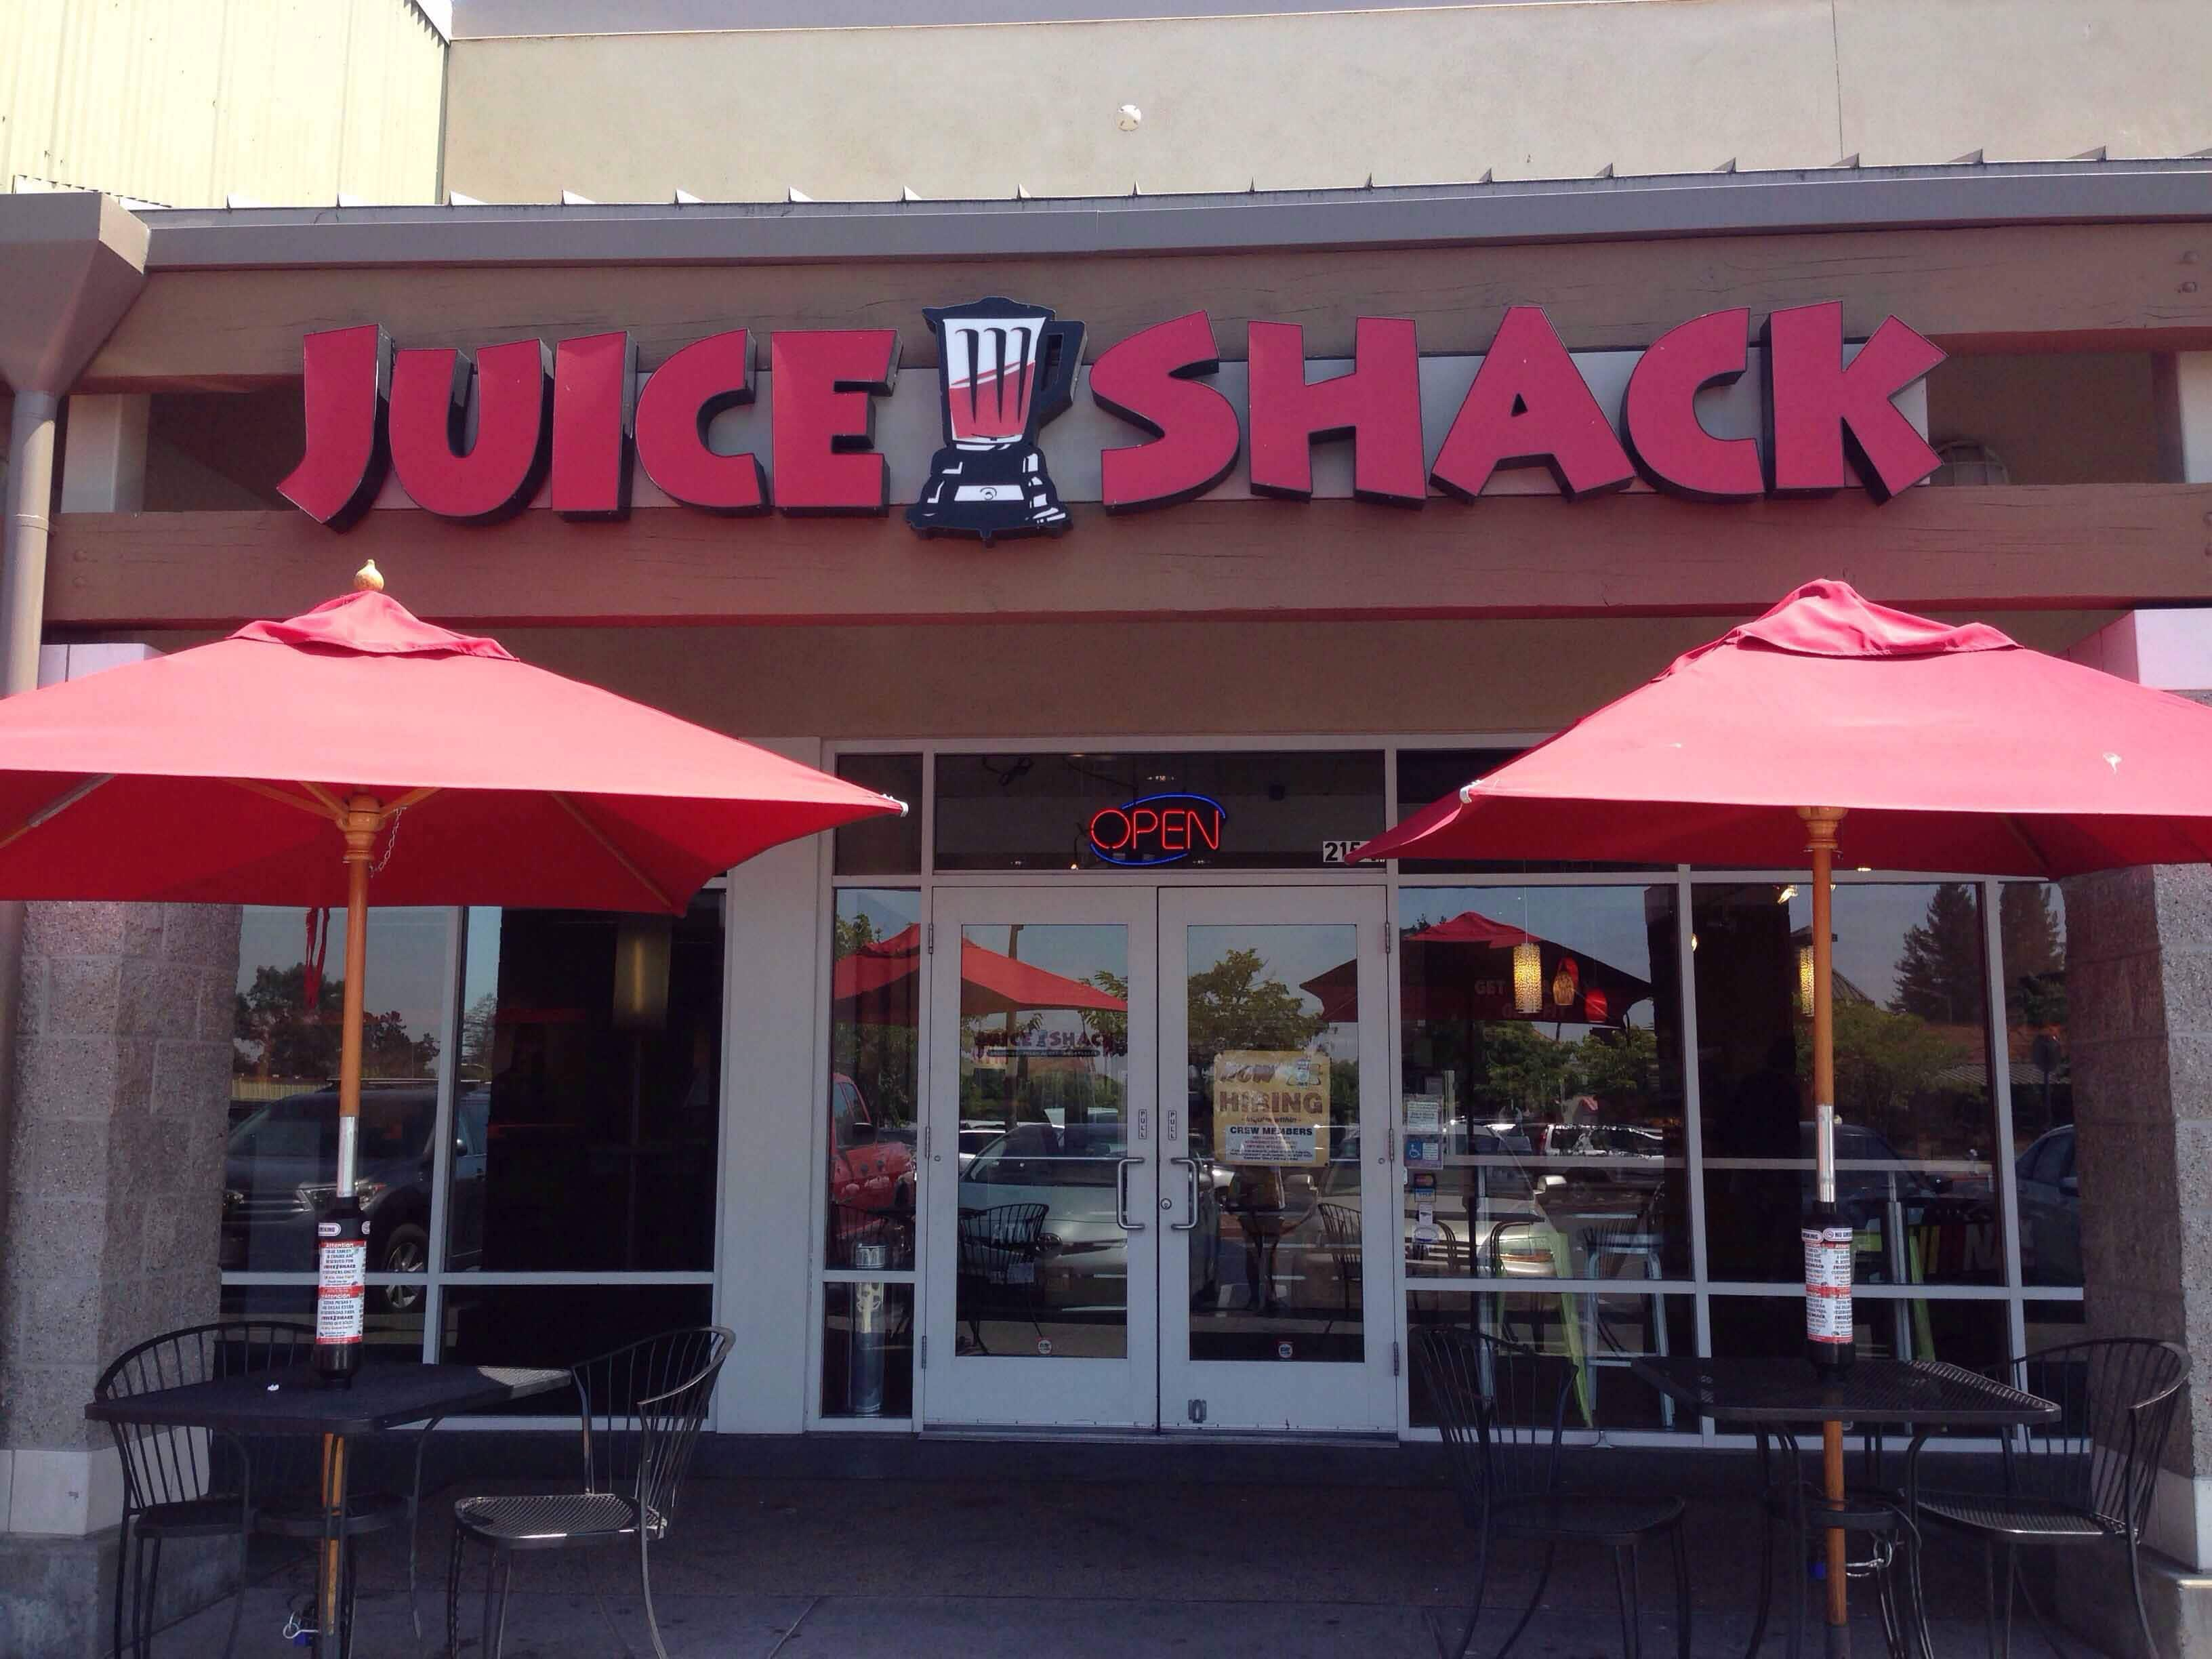 Juice shack santa rosa